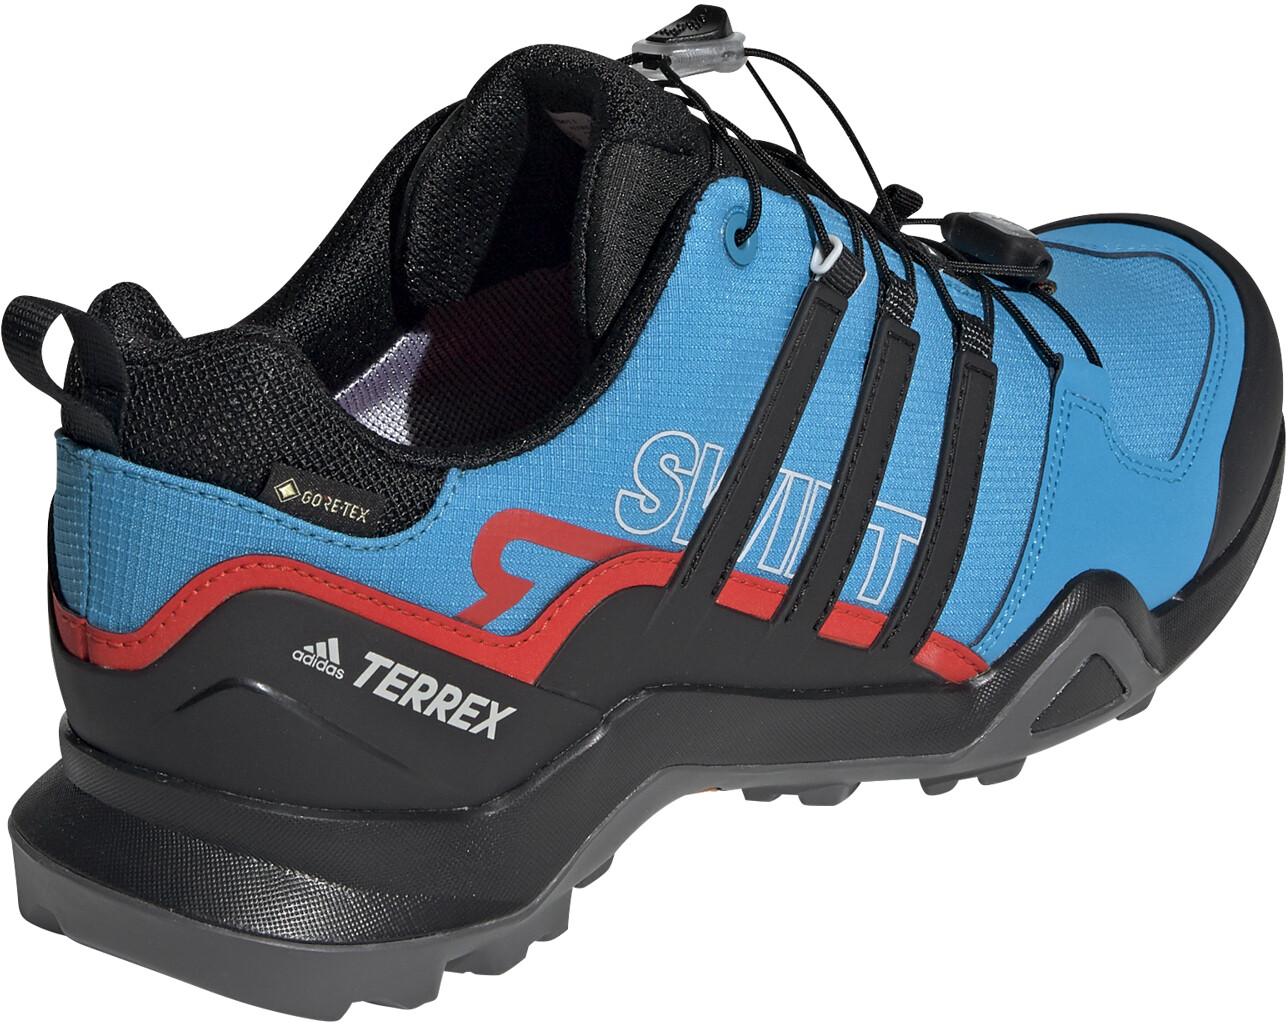 Adidas Terrex Swift R2 GTX OKWI39ZG0V | Red adidas TERREX